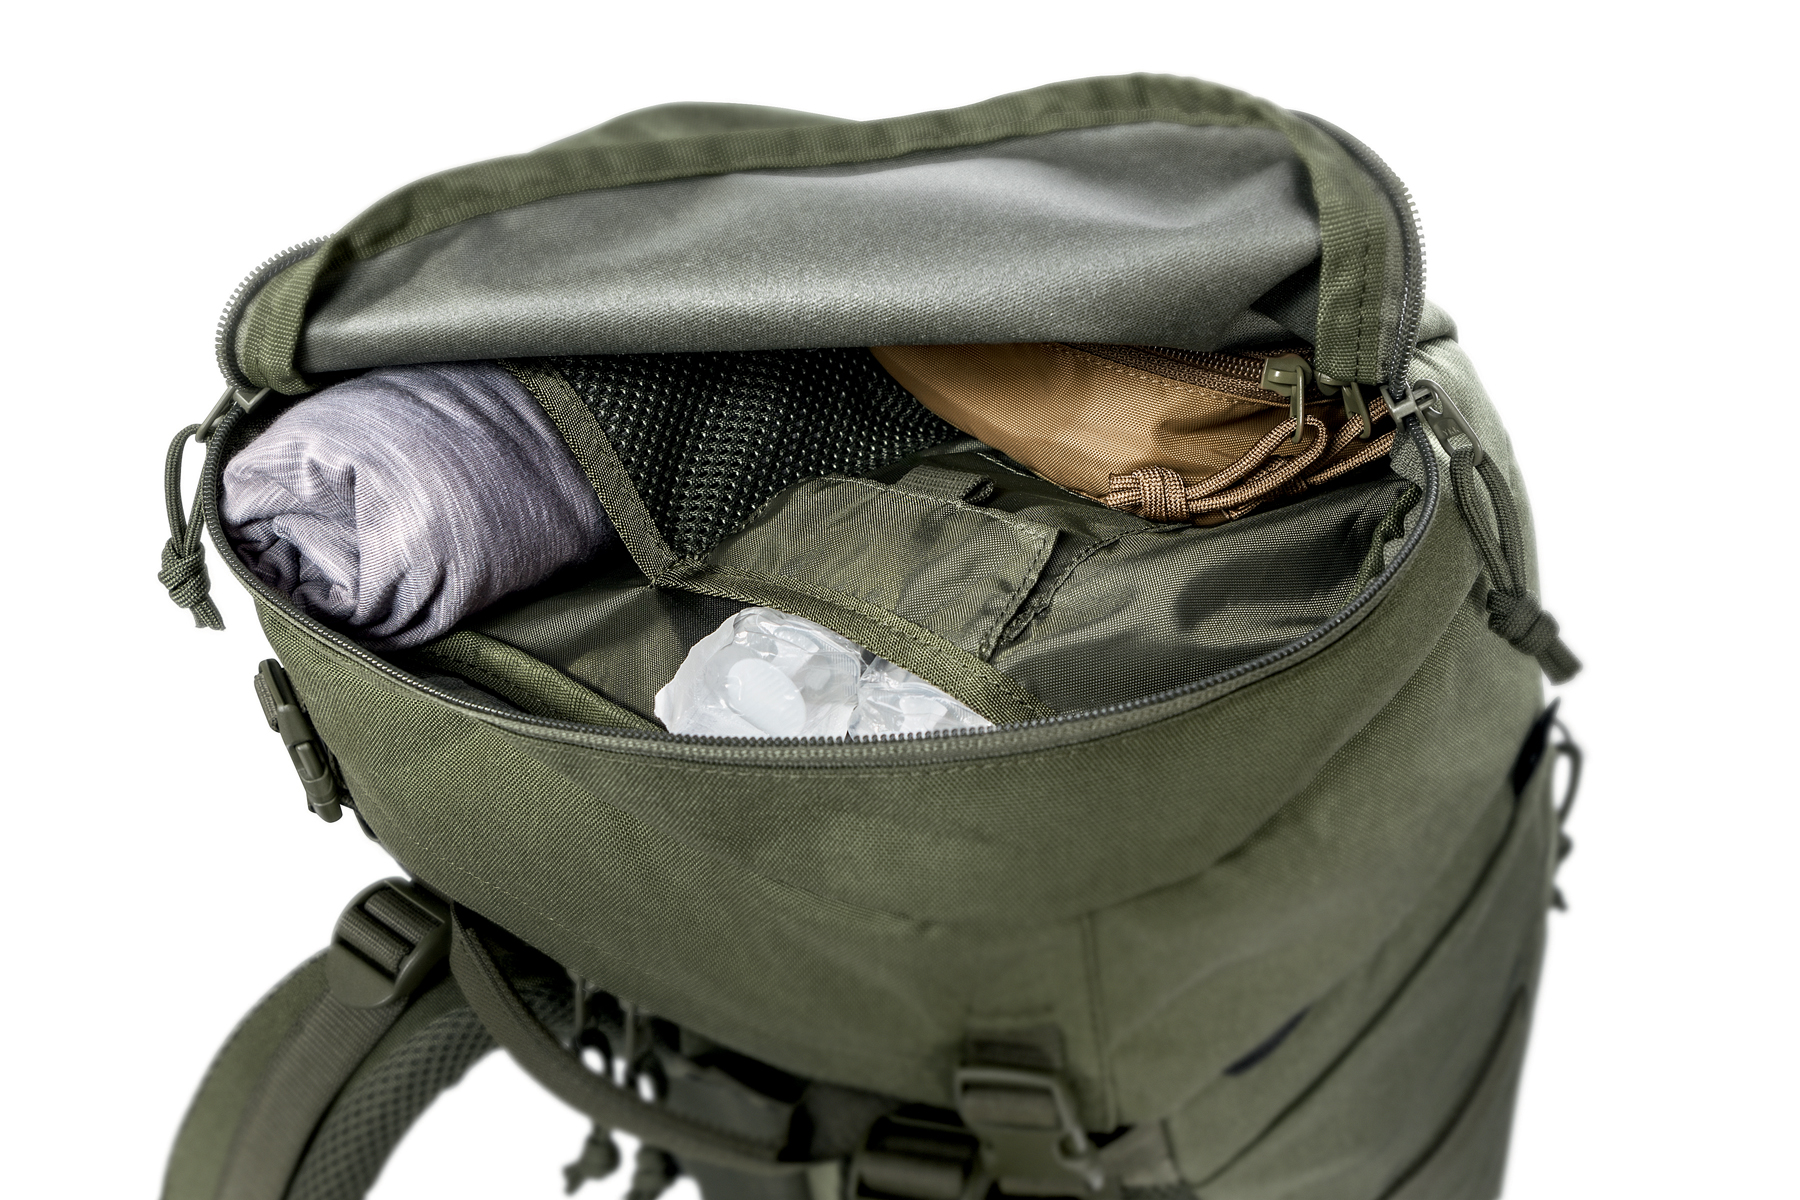 Tasmanian Tiger® Unveil the Modular Pack 45 Plus, a Modular, Universal Deployment Backpack